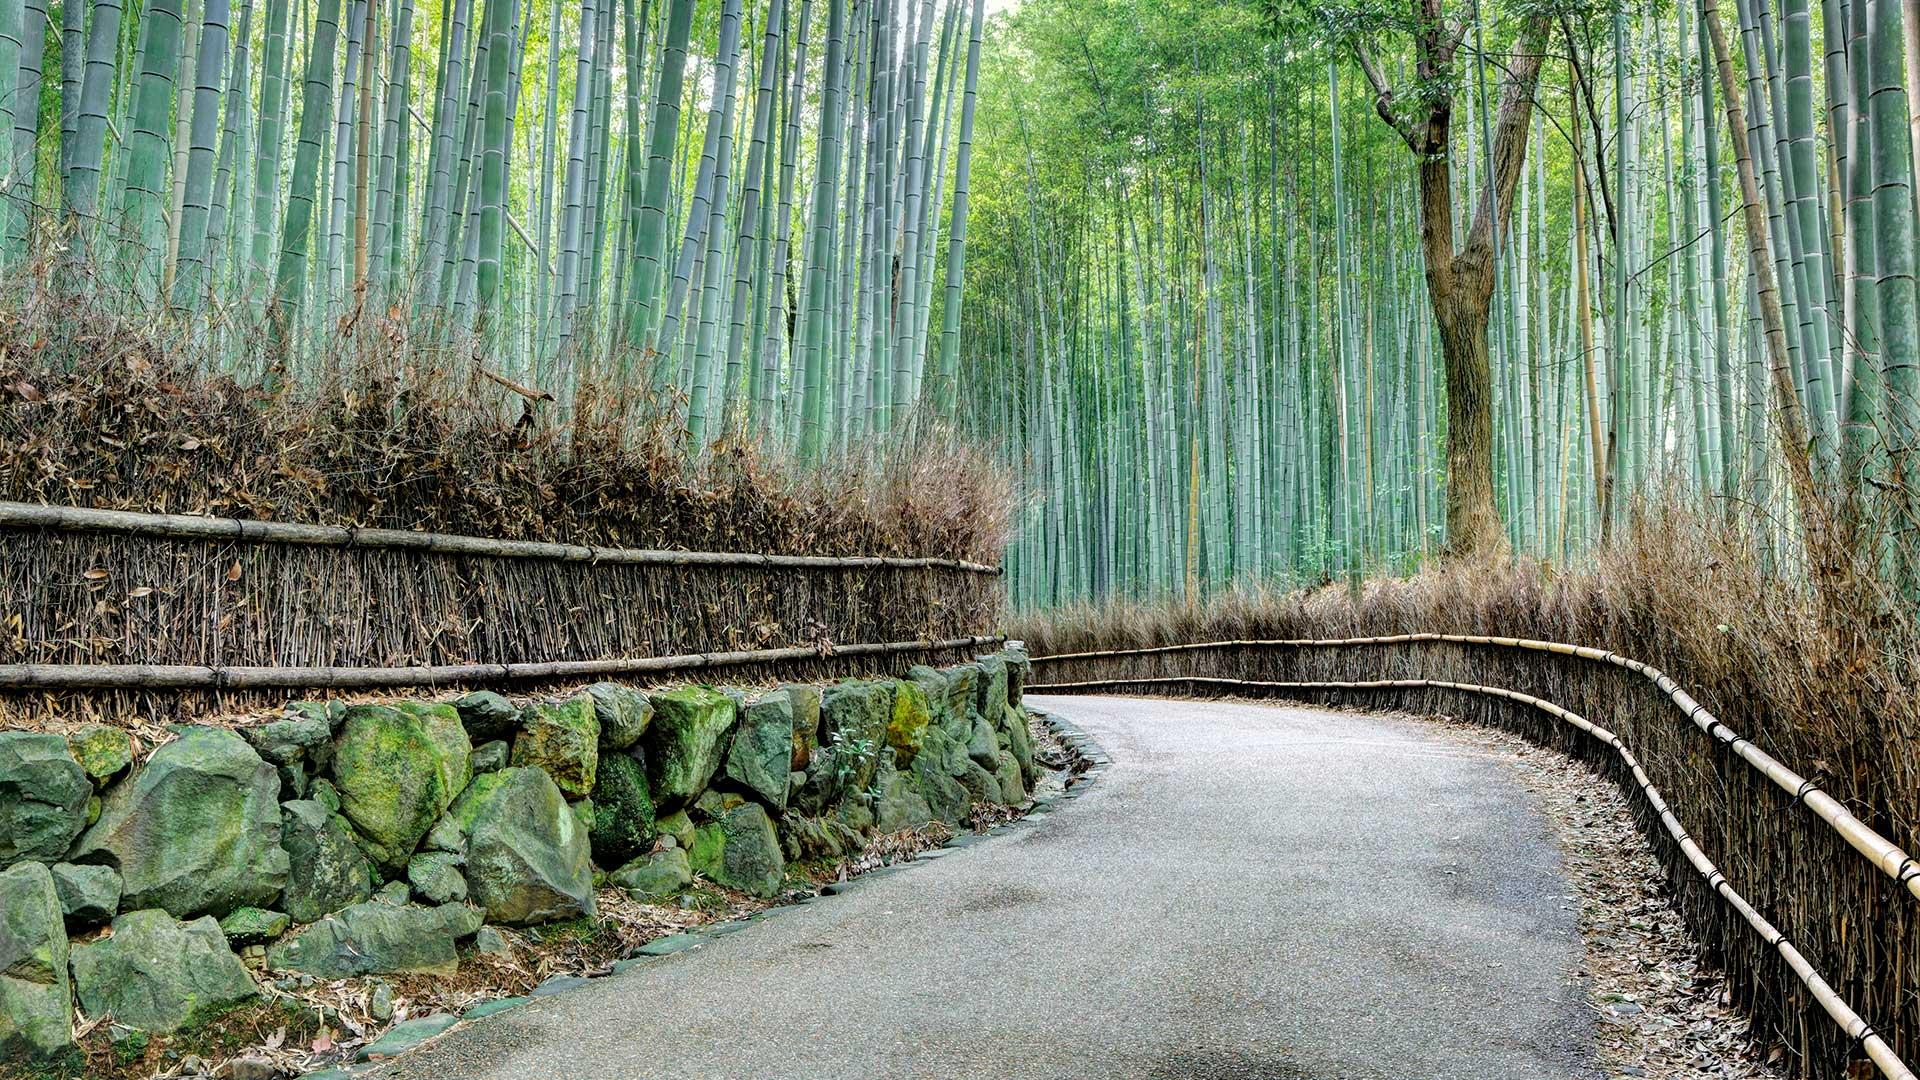 Road through the Arashiyama Bamboo Grove, Kyoto, Japan